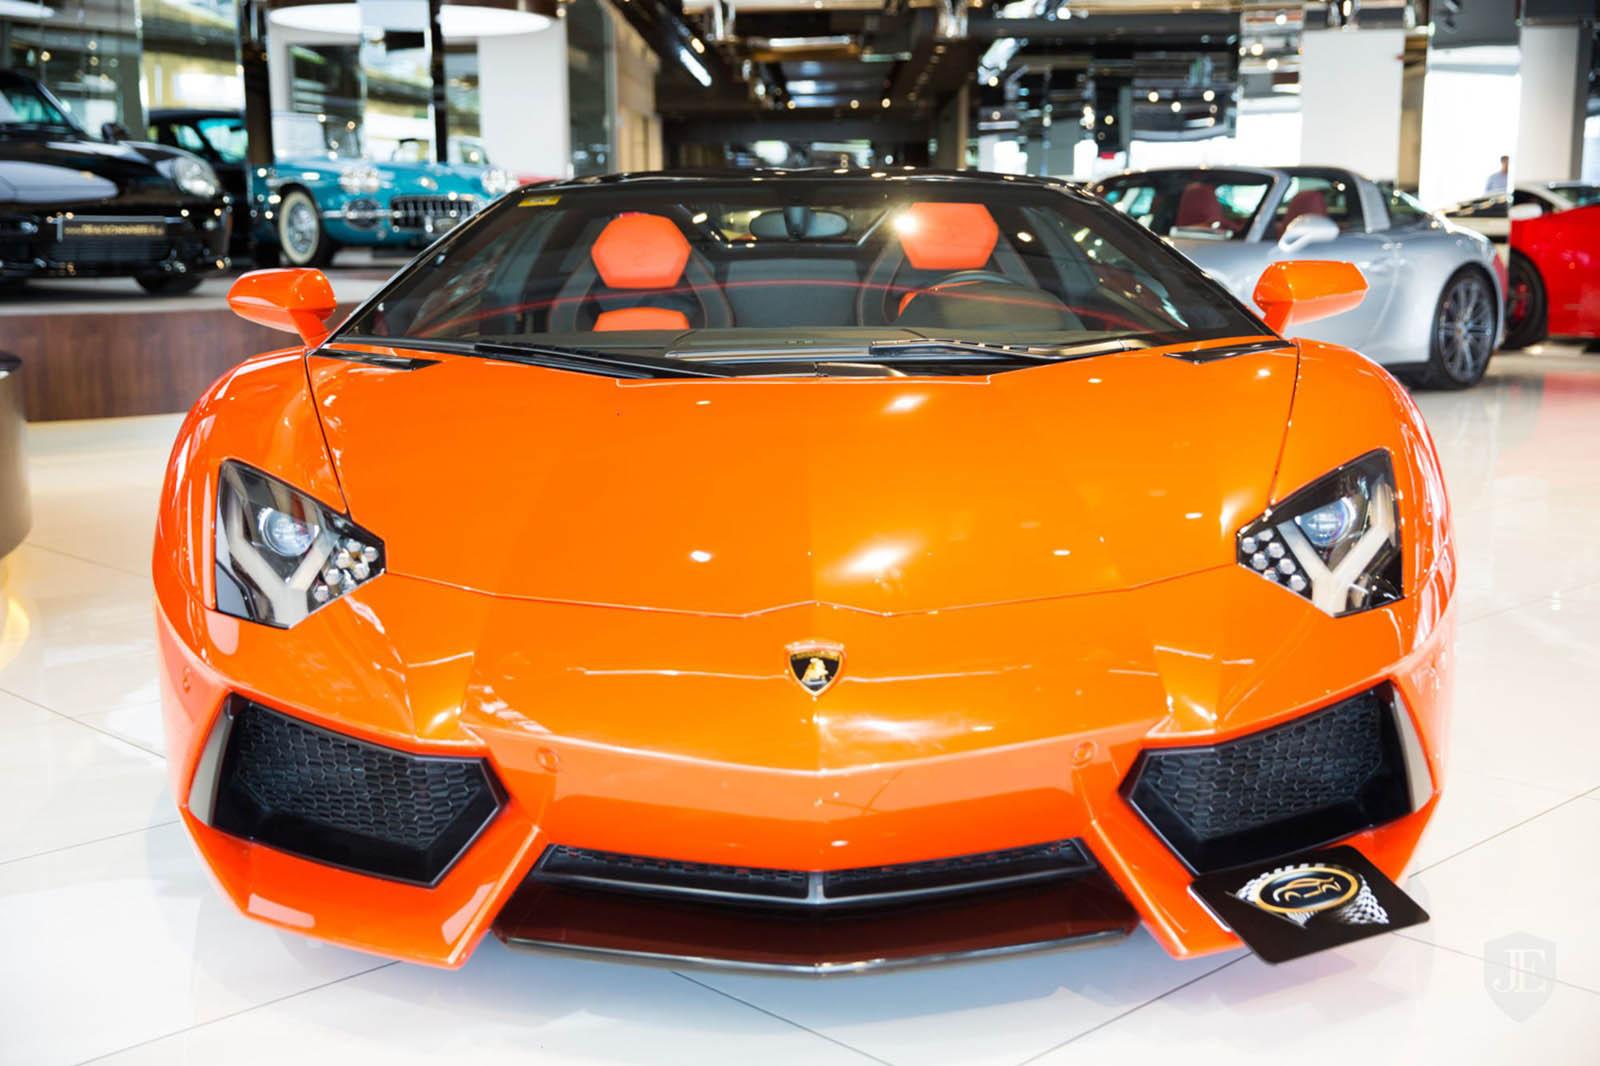 2017 Lambo Price >> Lamborghini Aventador In Pepto Pink Over Orange Has Got To Be Ironic | Carscoops